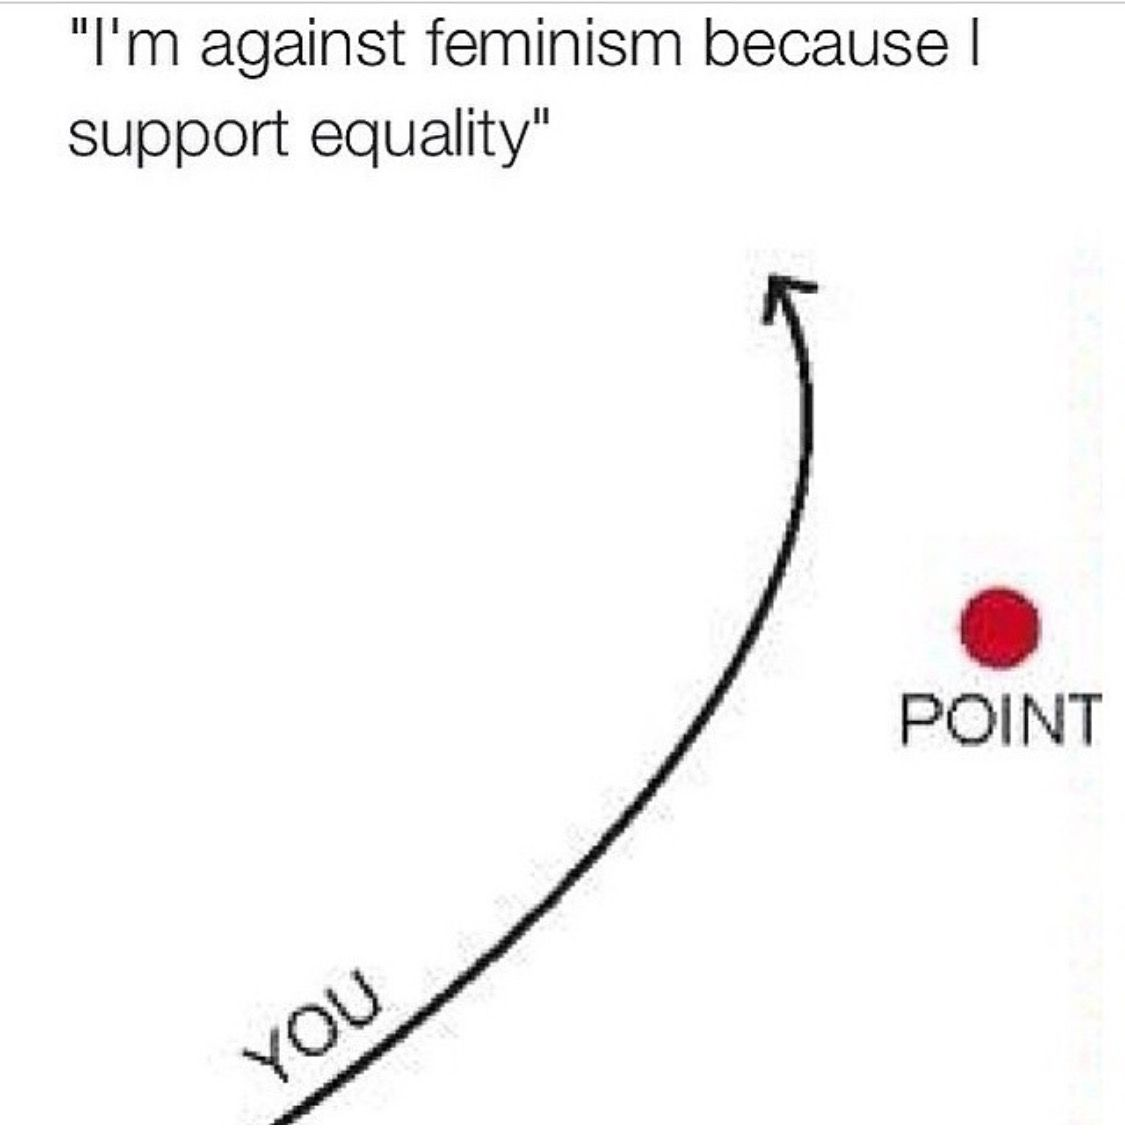 for the anti-feminist people. #feminism